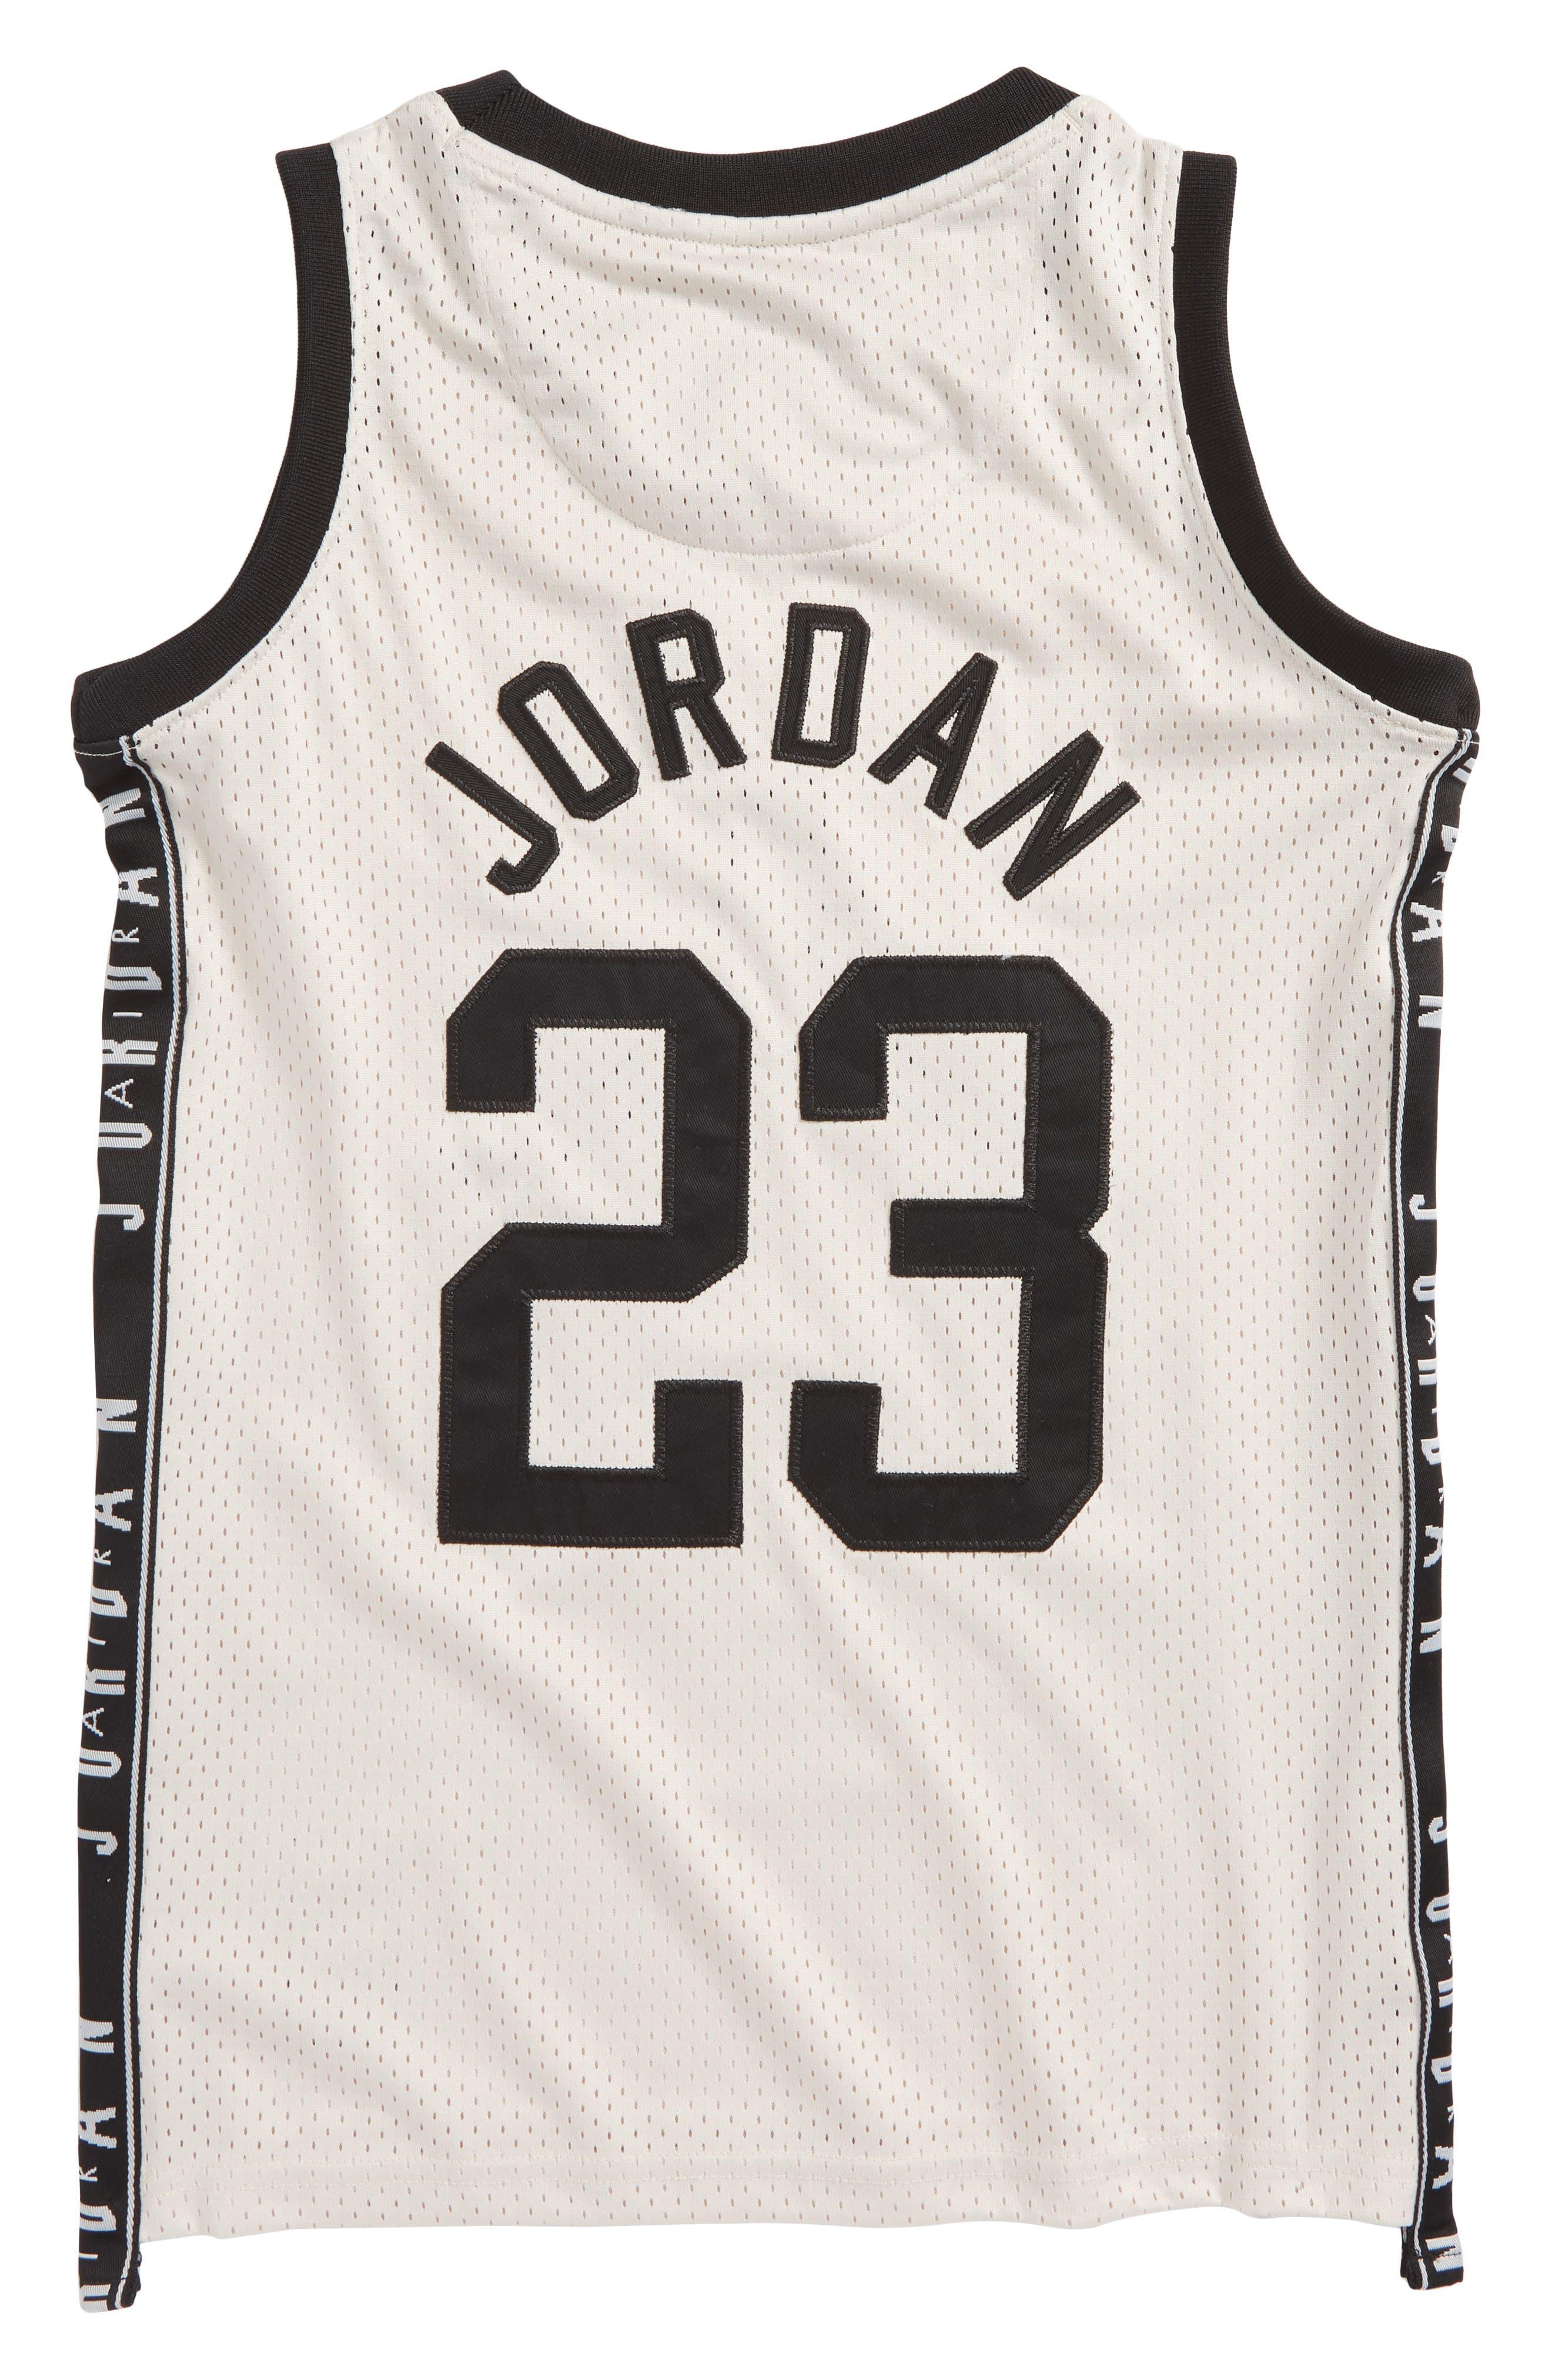 Jordan Rise Graphic Tape Jersey,                             Alternate thumbnail 2, color,                             281